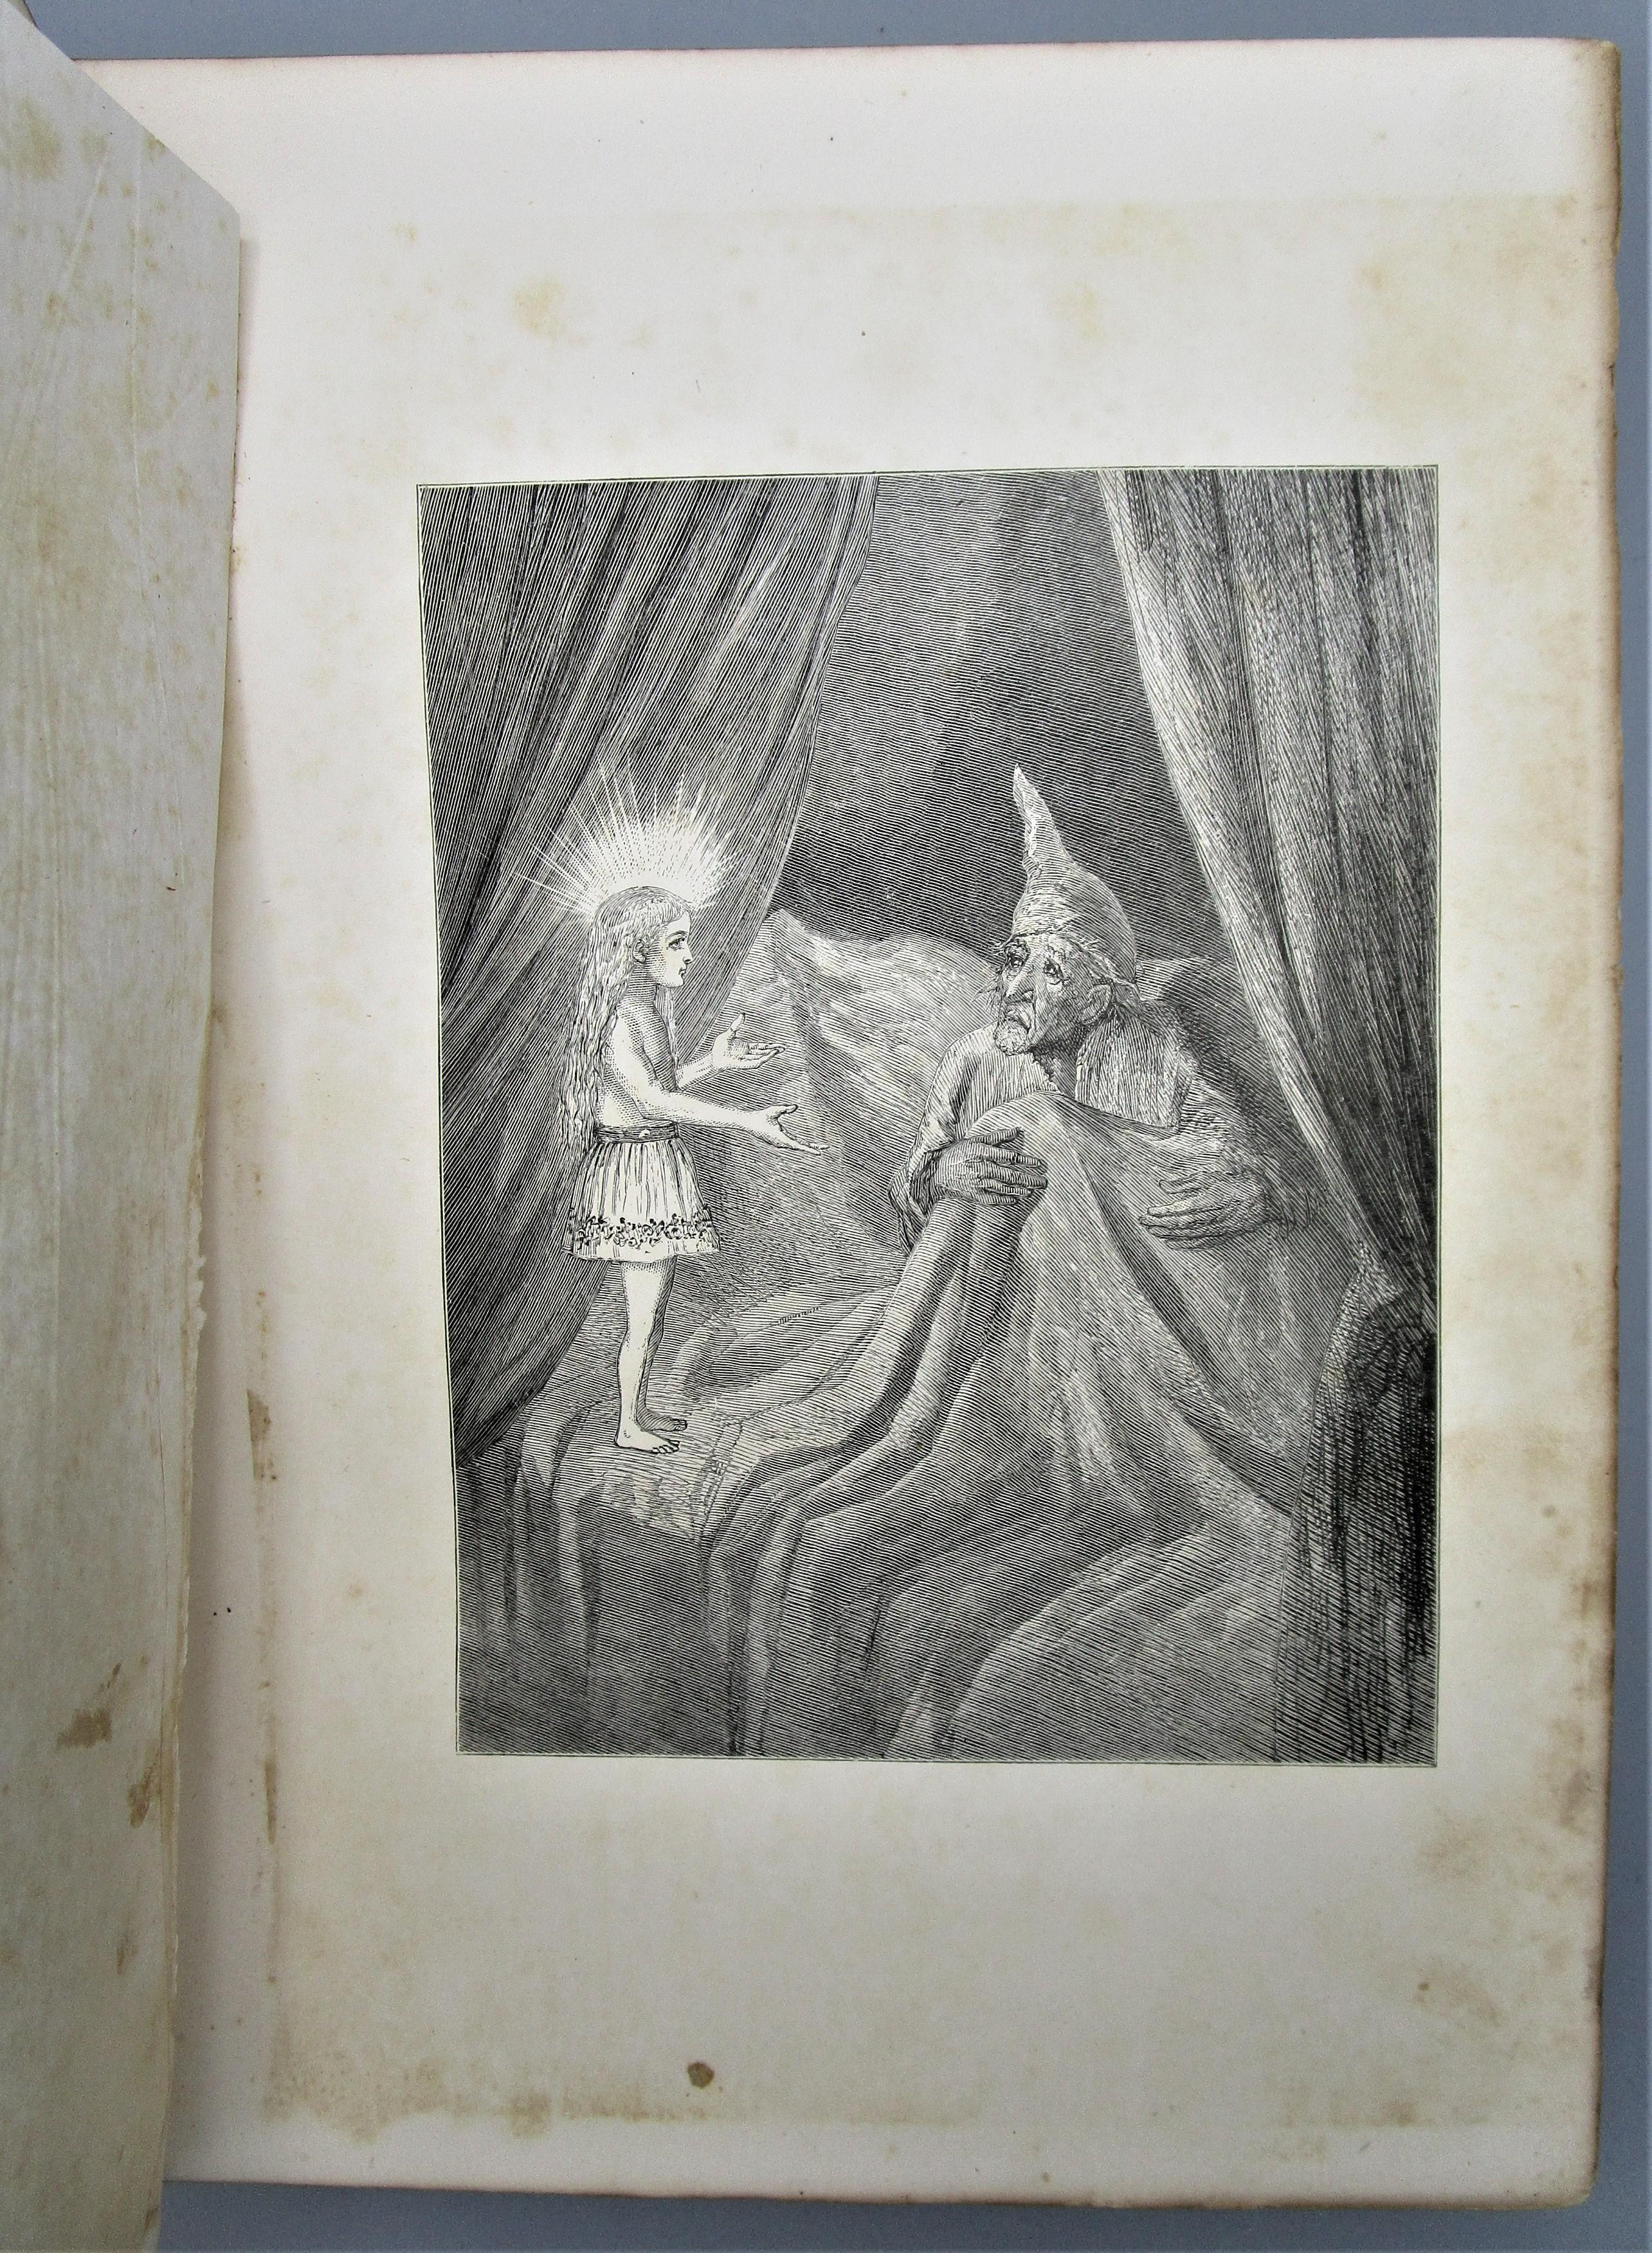 A CHRISTMAS CAROL IN PROSE, by Charles Dickens; illus by Eytinge - 1869